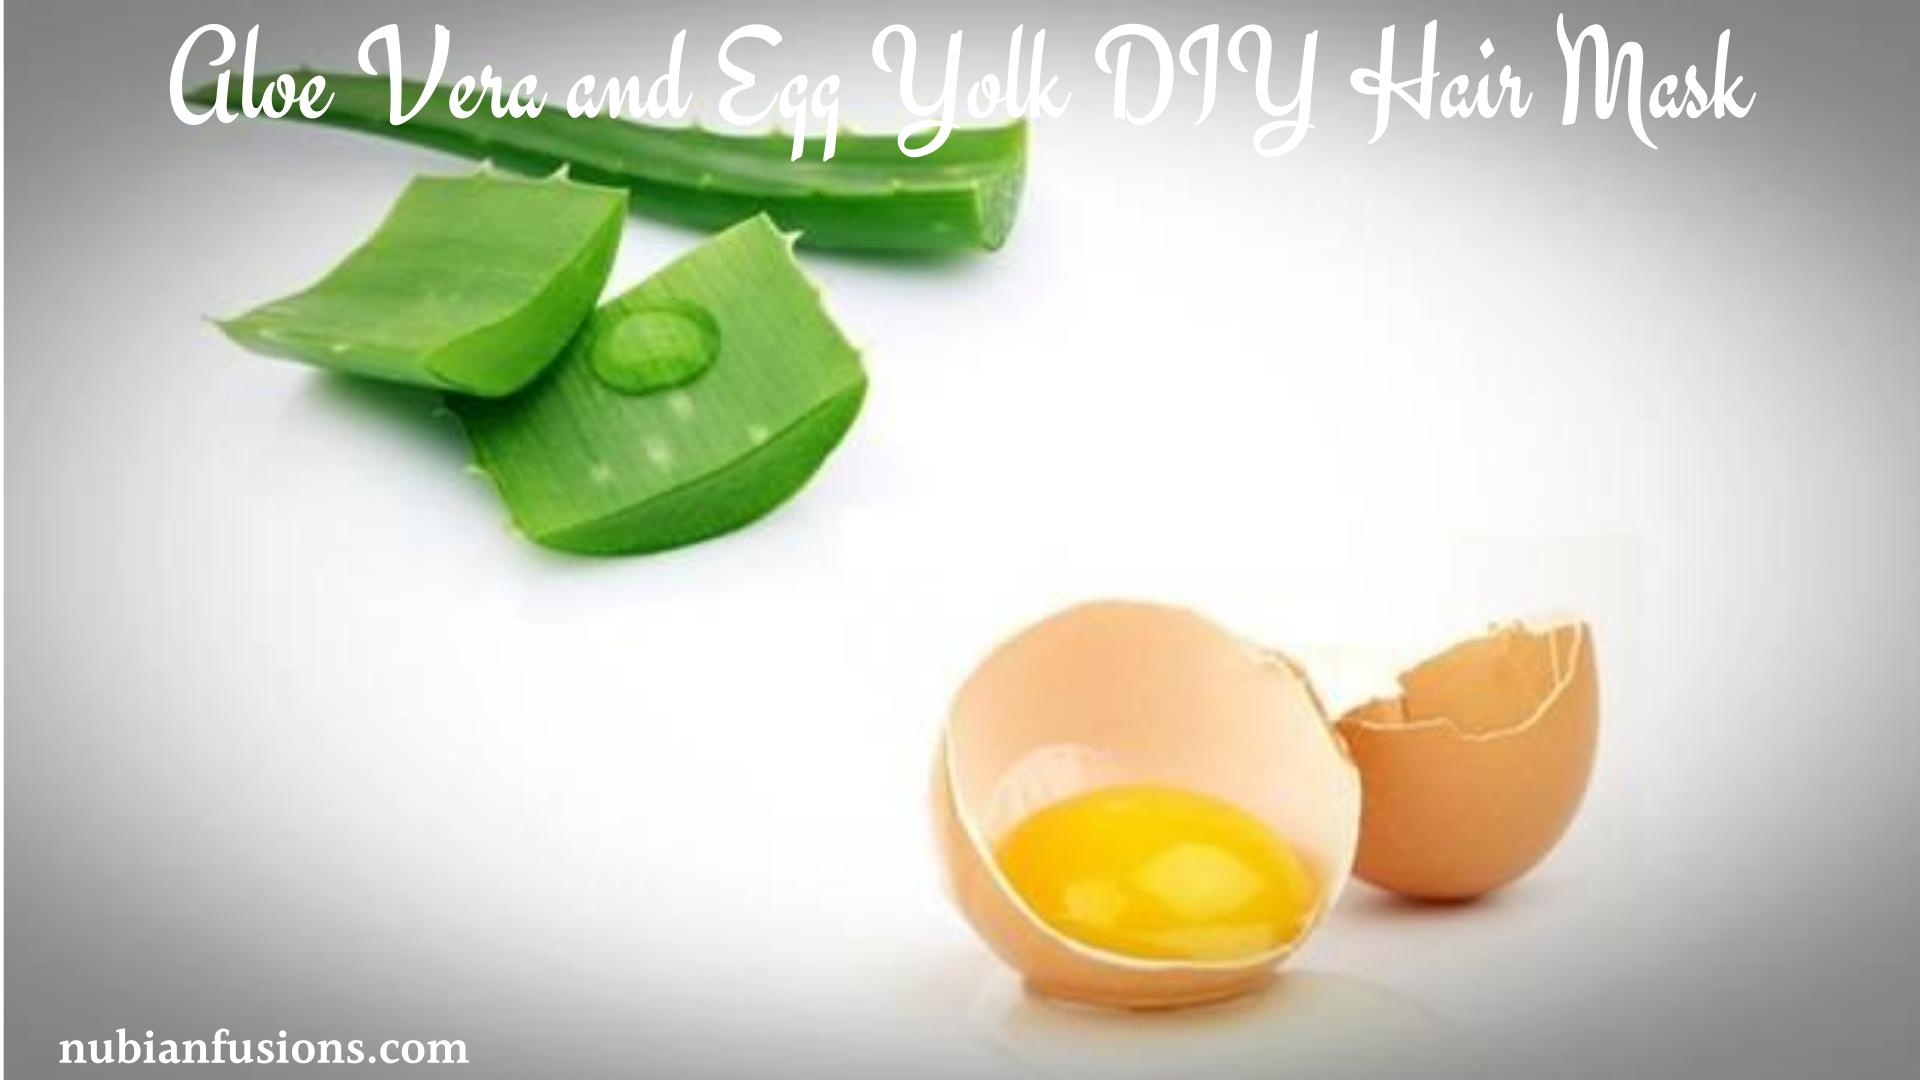 Aloe Vera and Egg Yolk DIY Hair Mask